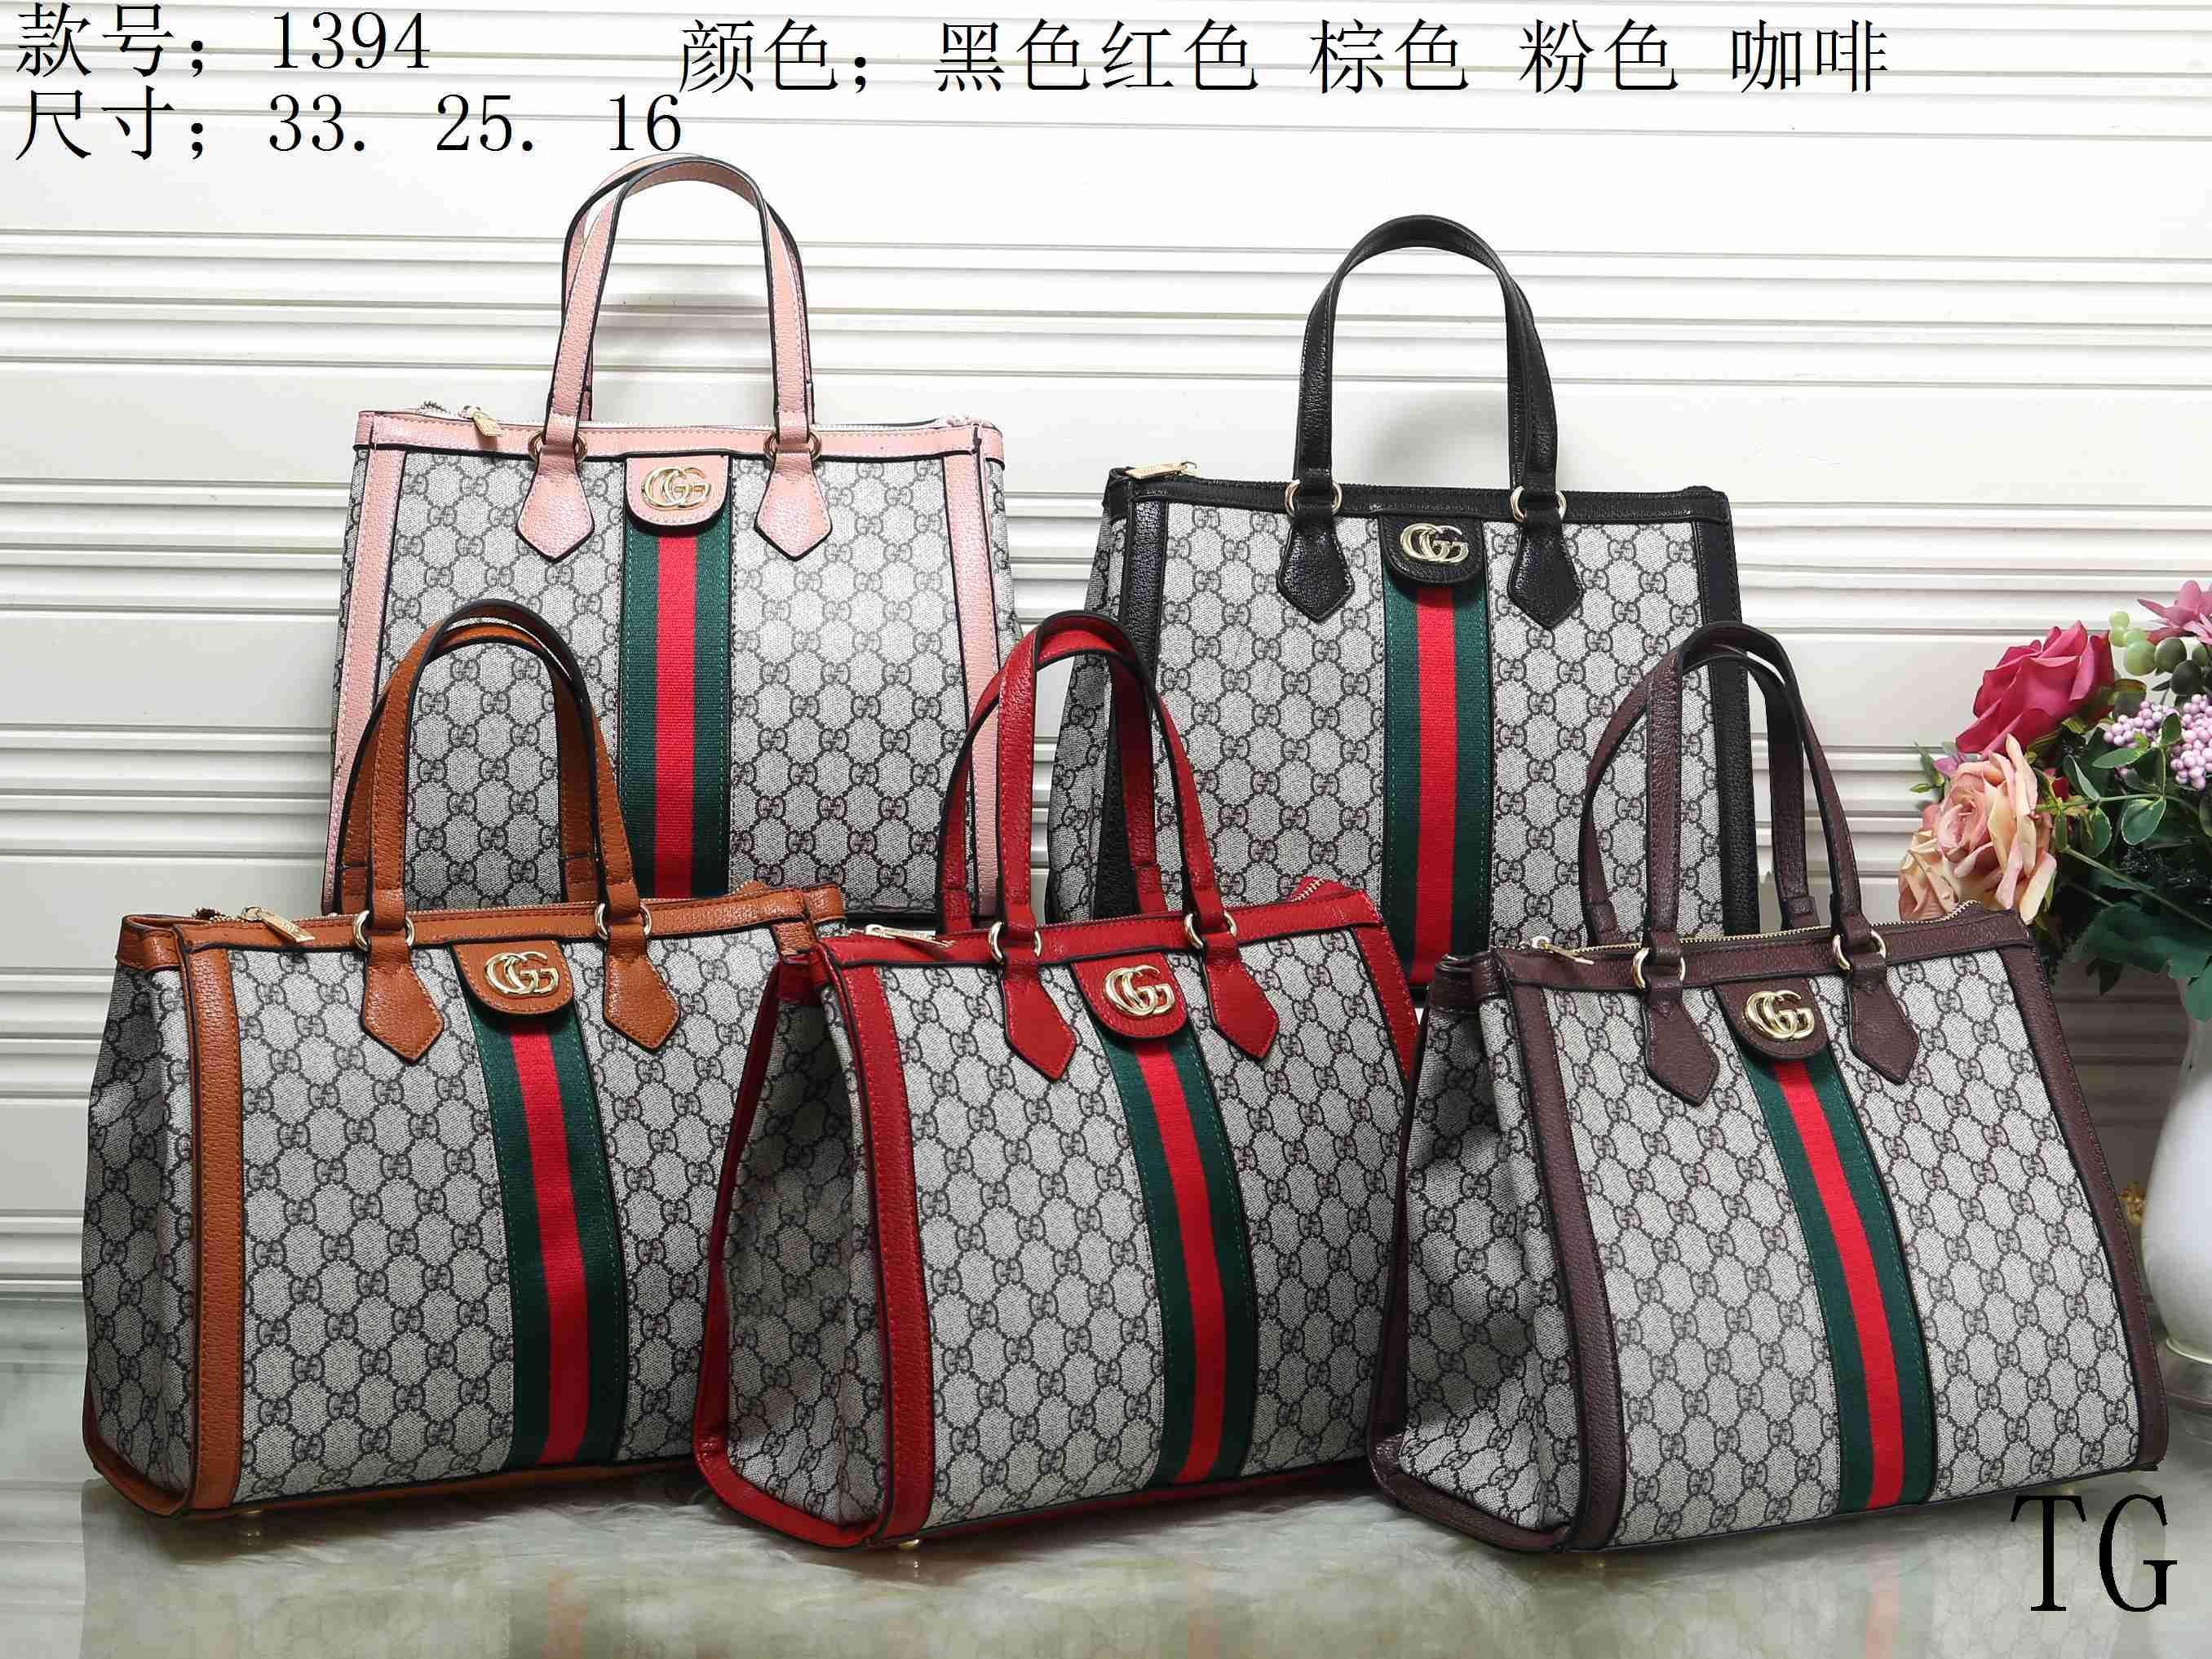 9323d6adb 2018 NEW Styles Fashion Bags Ladies Handbags Designer Bags Women Tote Bag  Luxury Brands Bags Single Shoulder Bag Backpack 1394 Crossbody Purse Travel  Bags ...